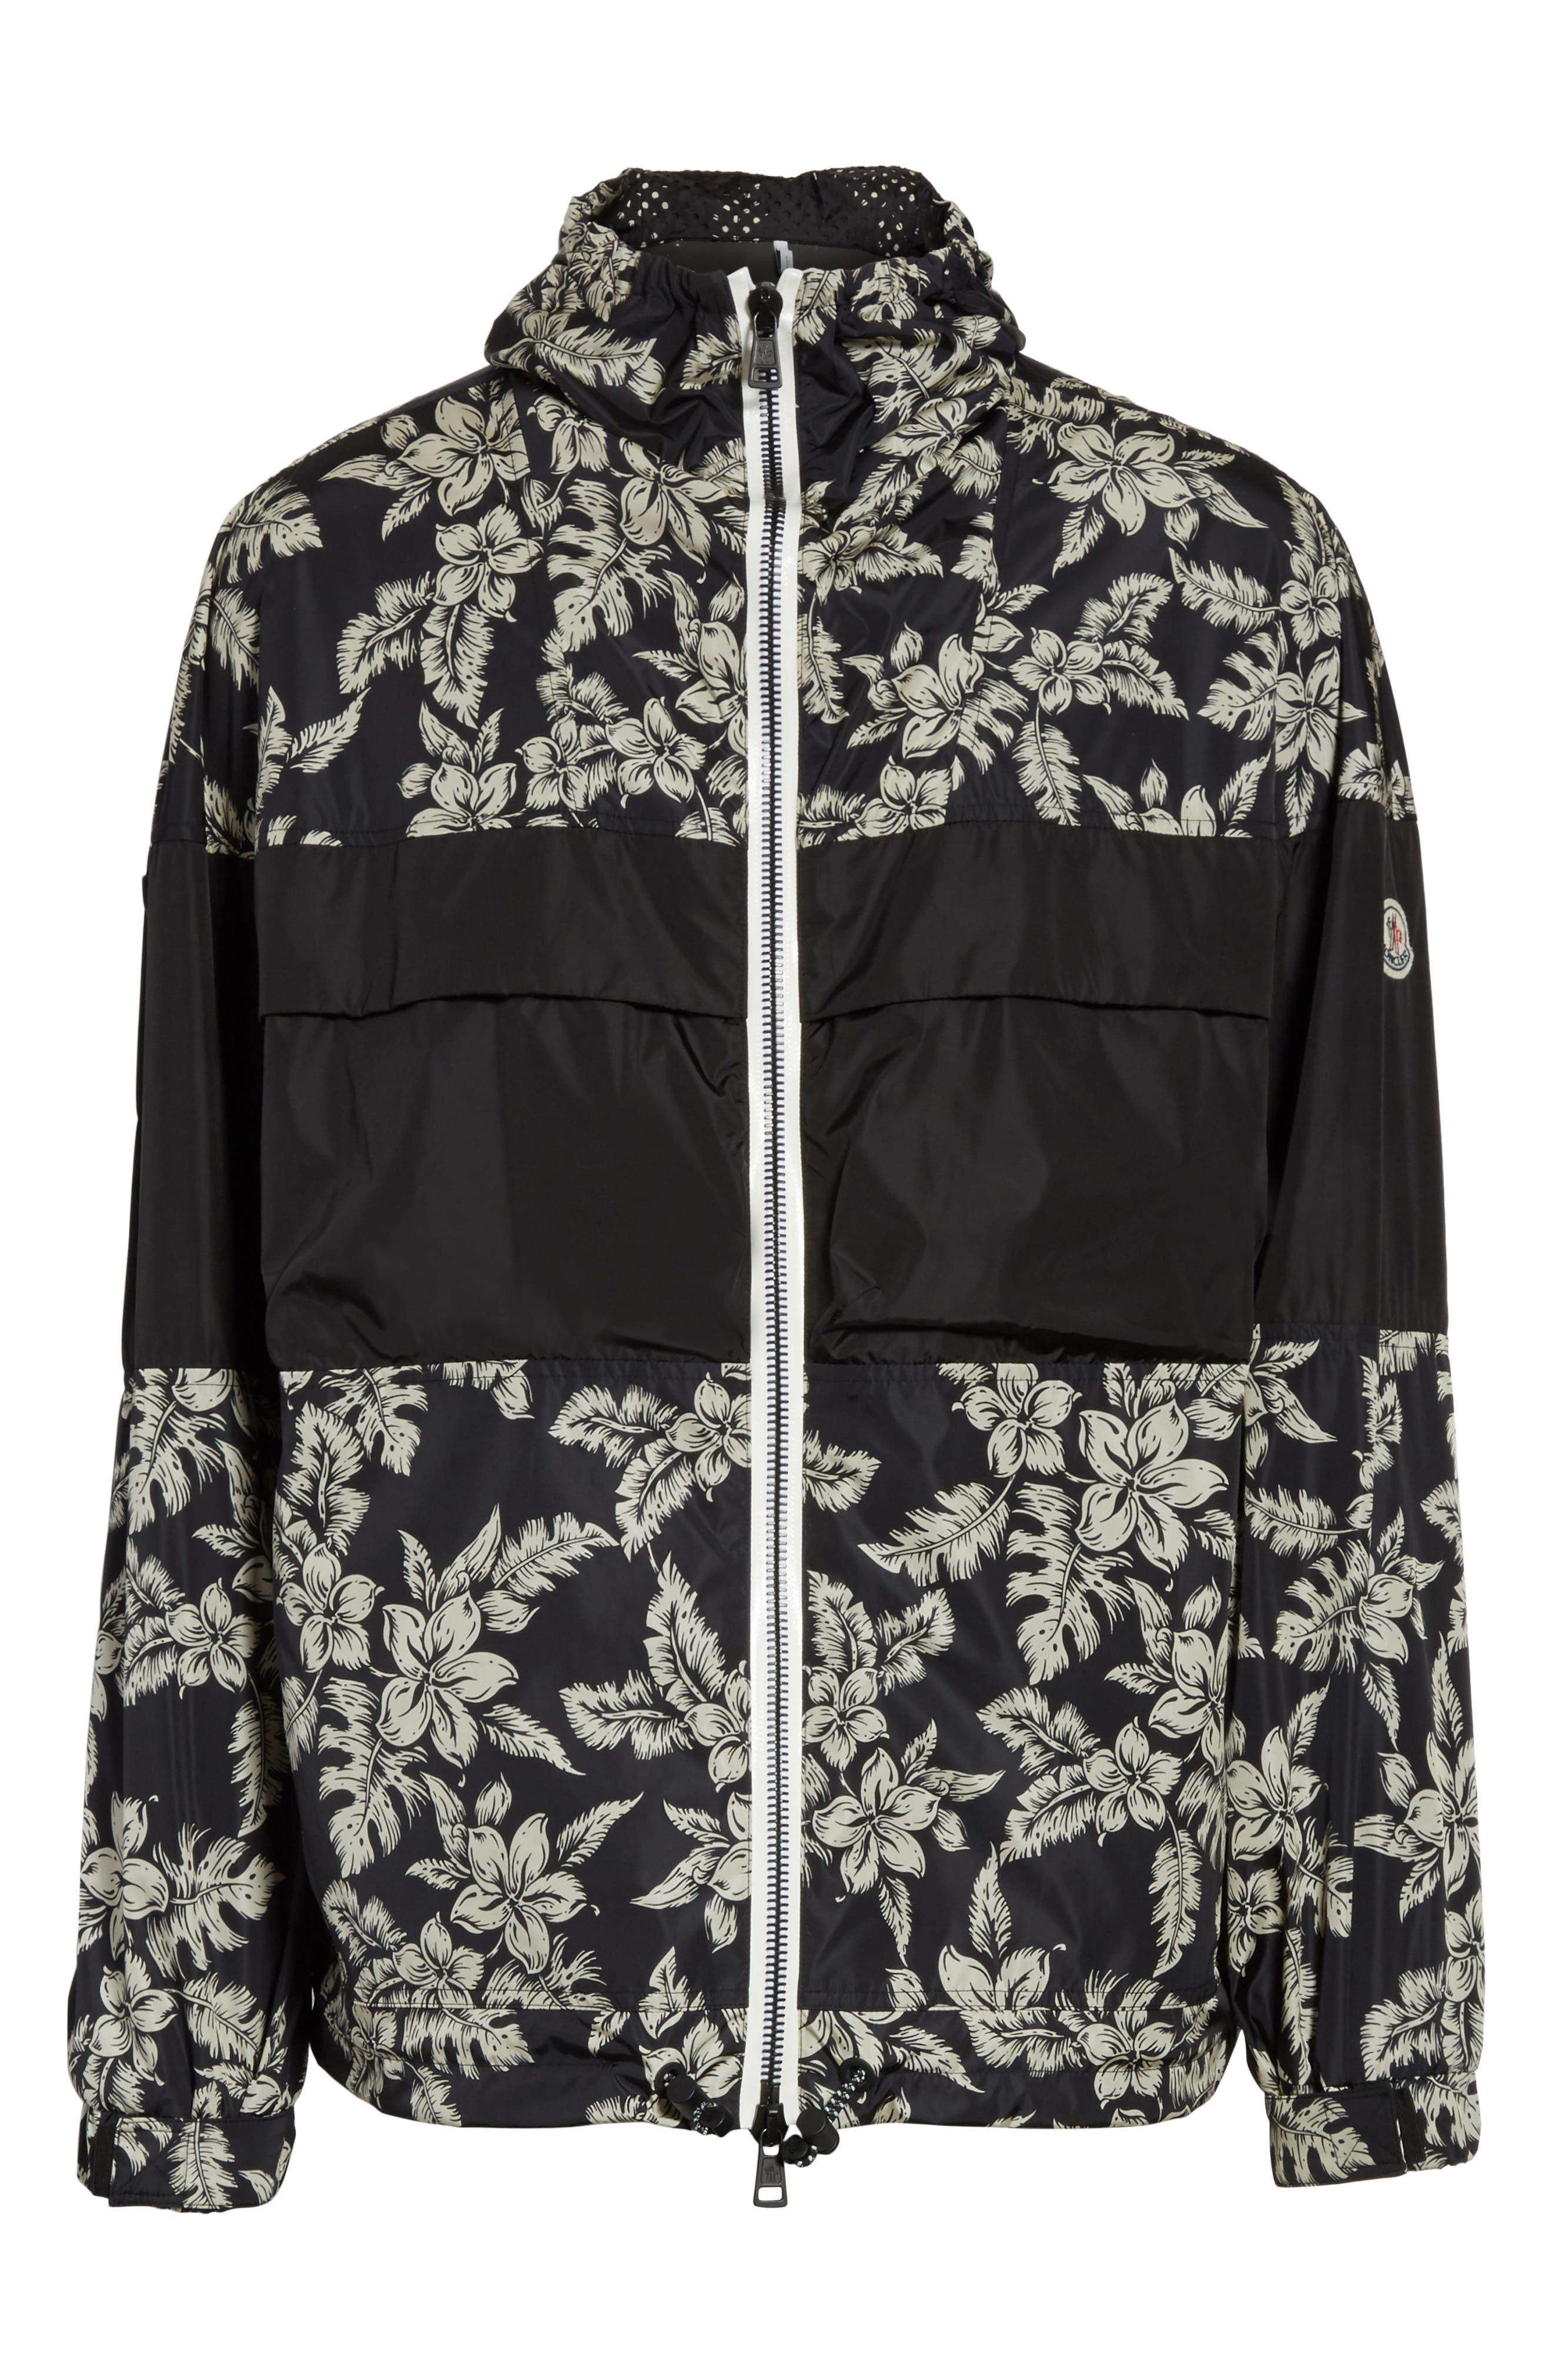 Thiou Floral Print Jacket,                             Alternate thumbnail 6, color,                             Black